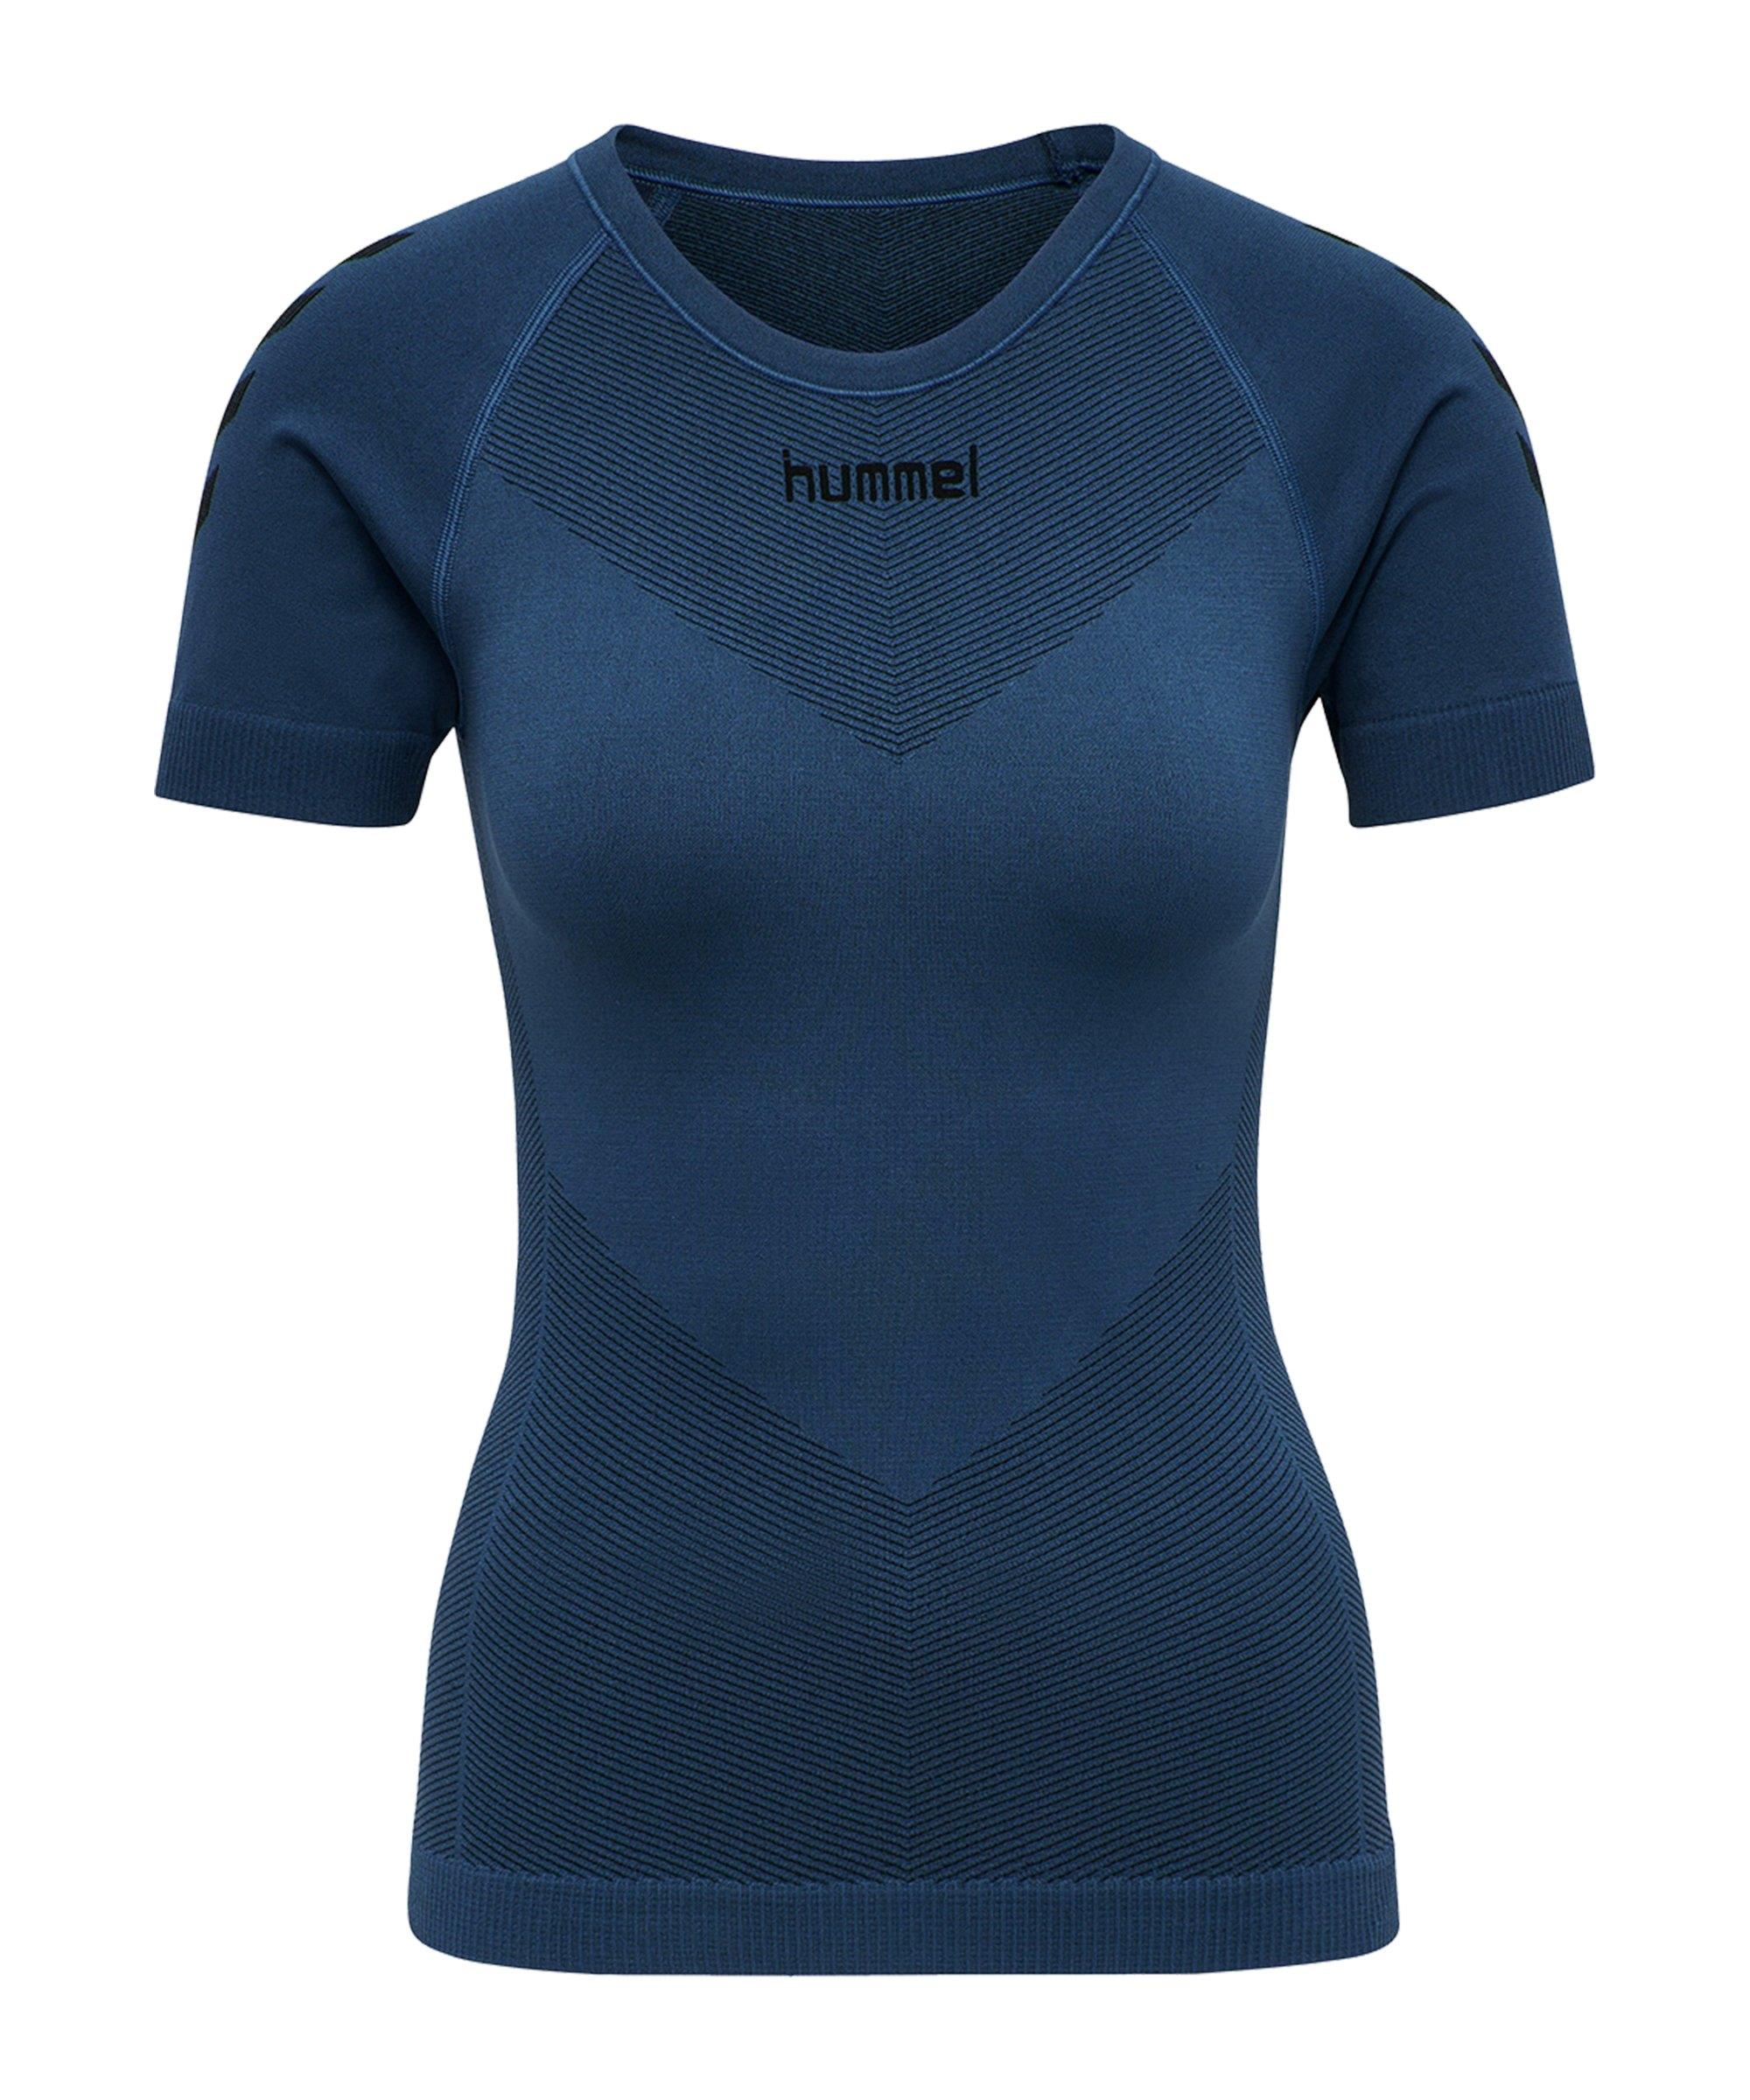 Hummel First Seamless T-Shirt Damen Blau F7642 - blau